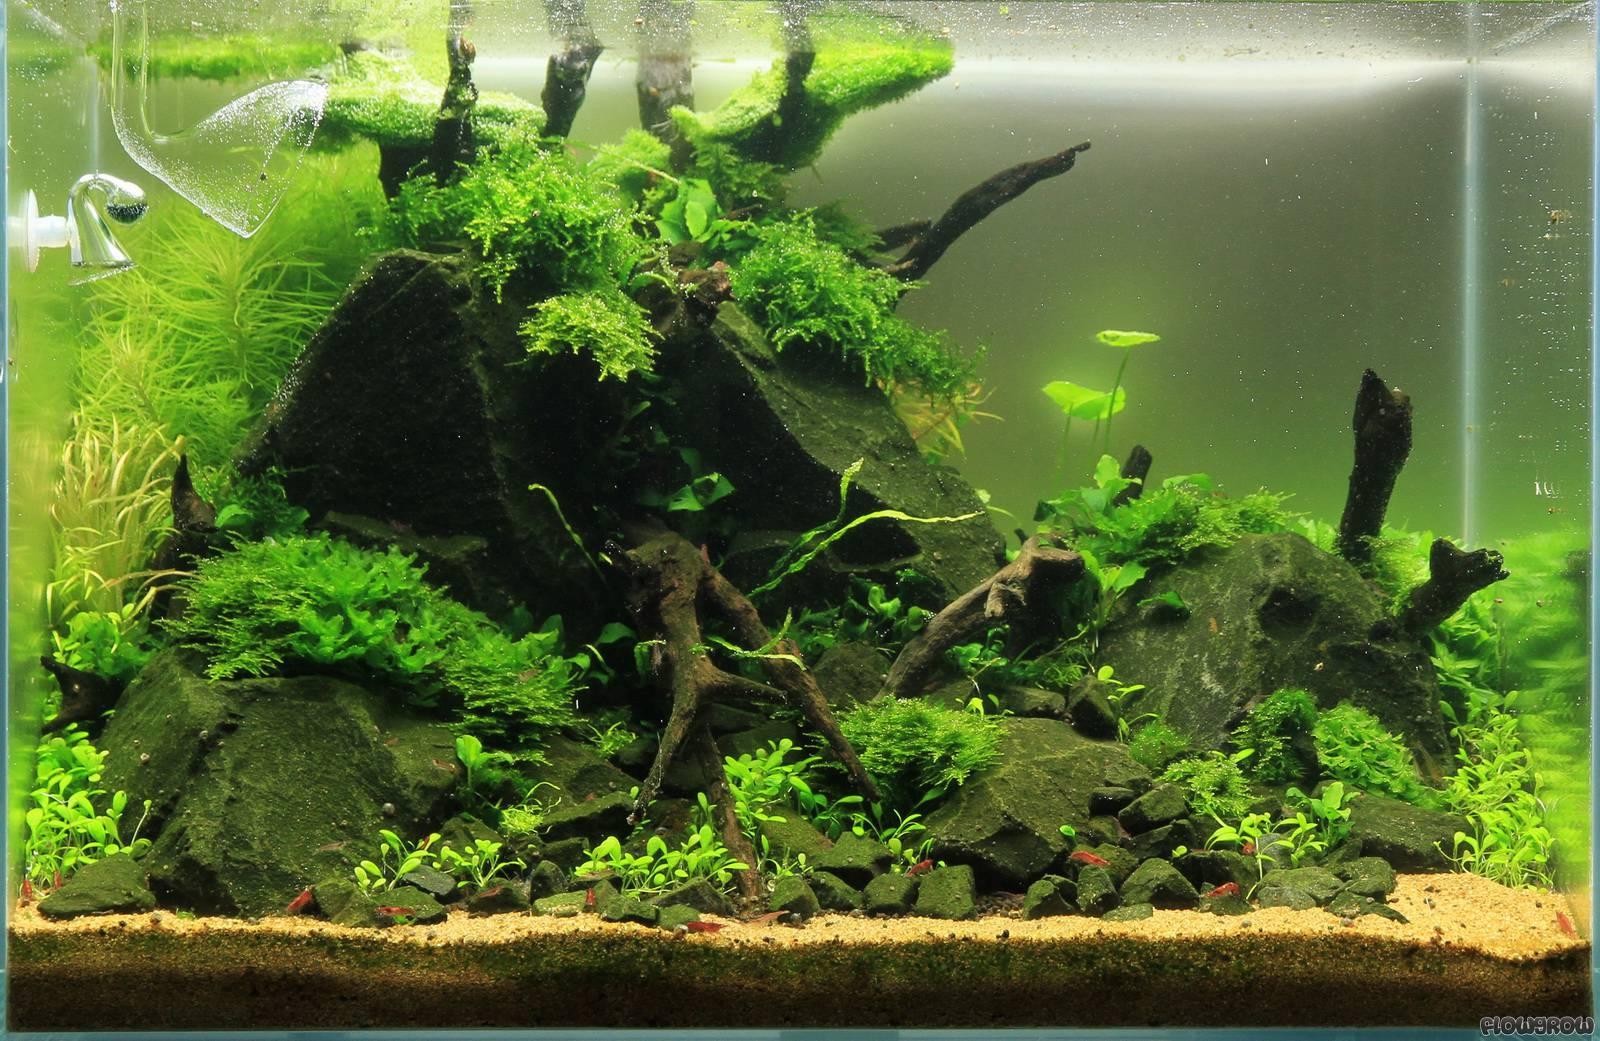 how to grow moss on rocks in aquarium